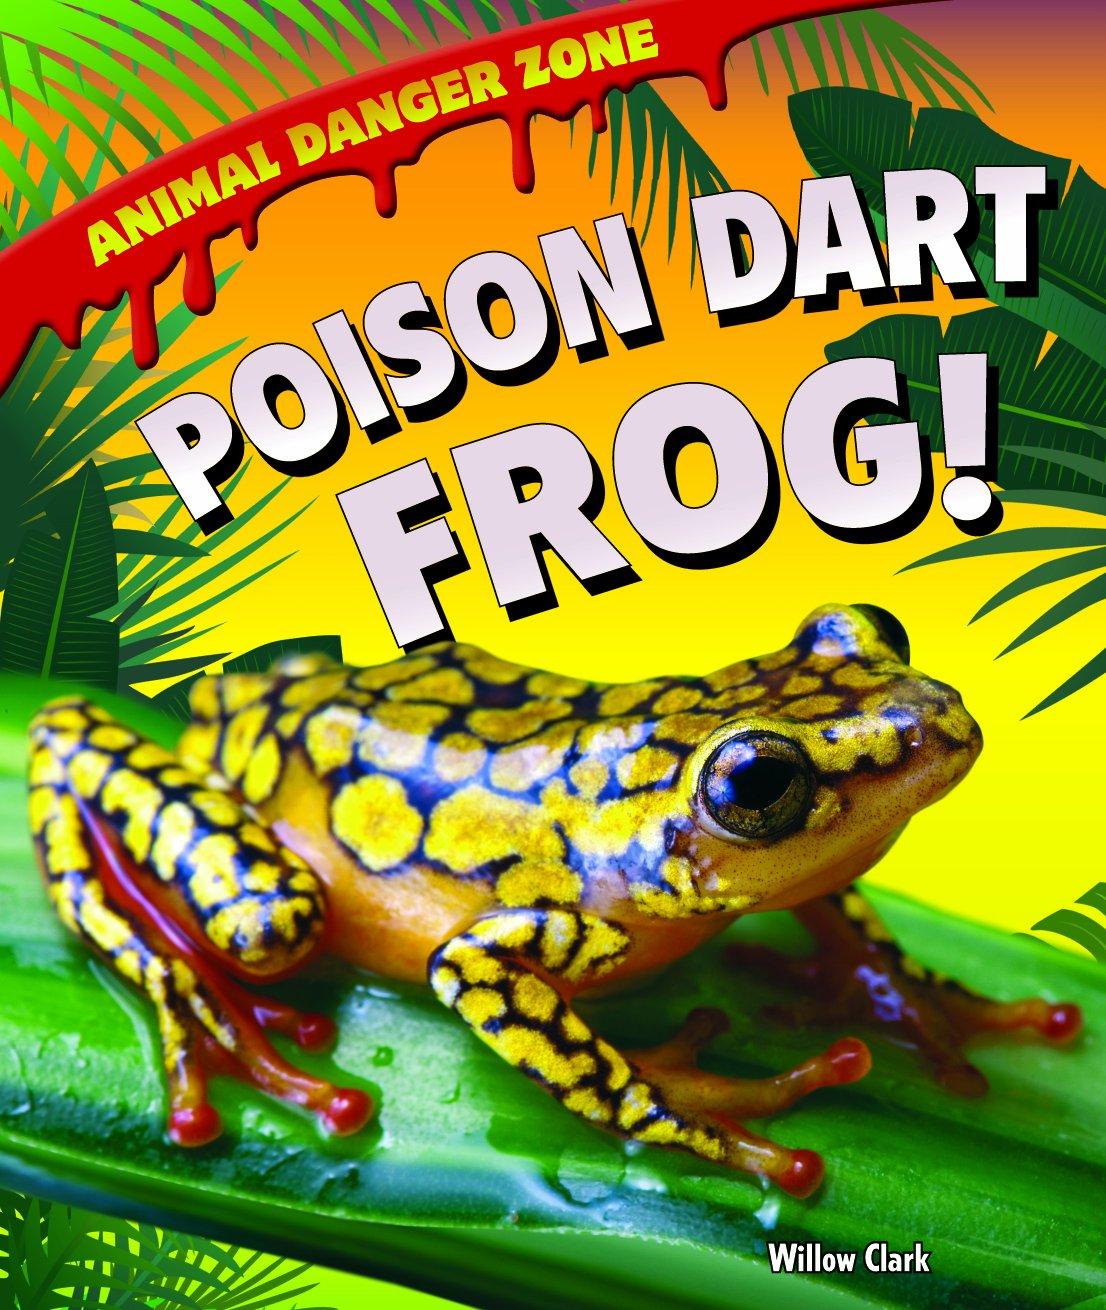 Poison Dart Frog! (Animal Danger Zone) pdf epub